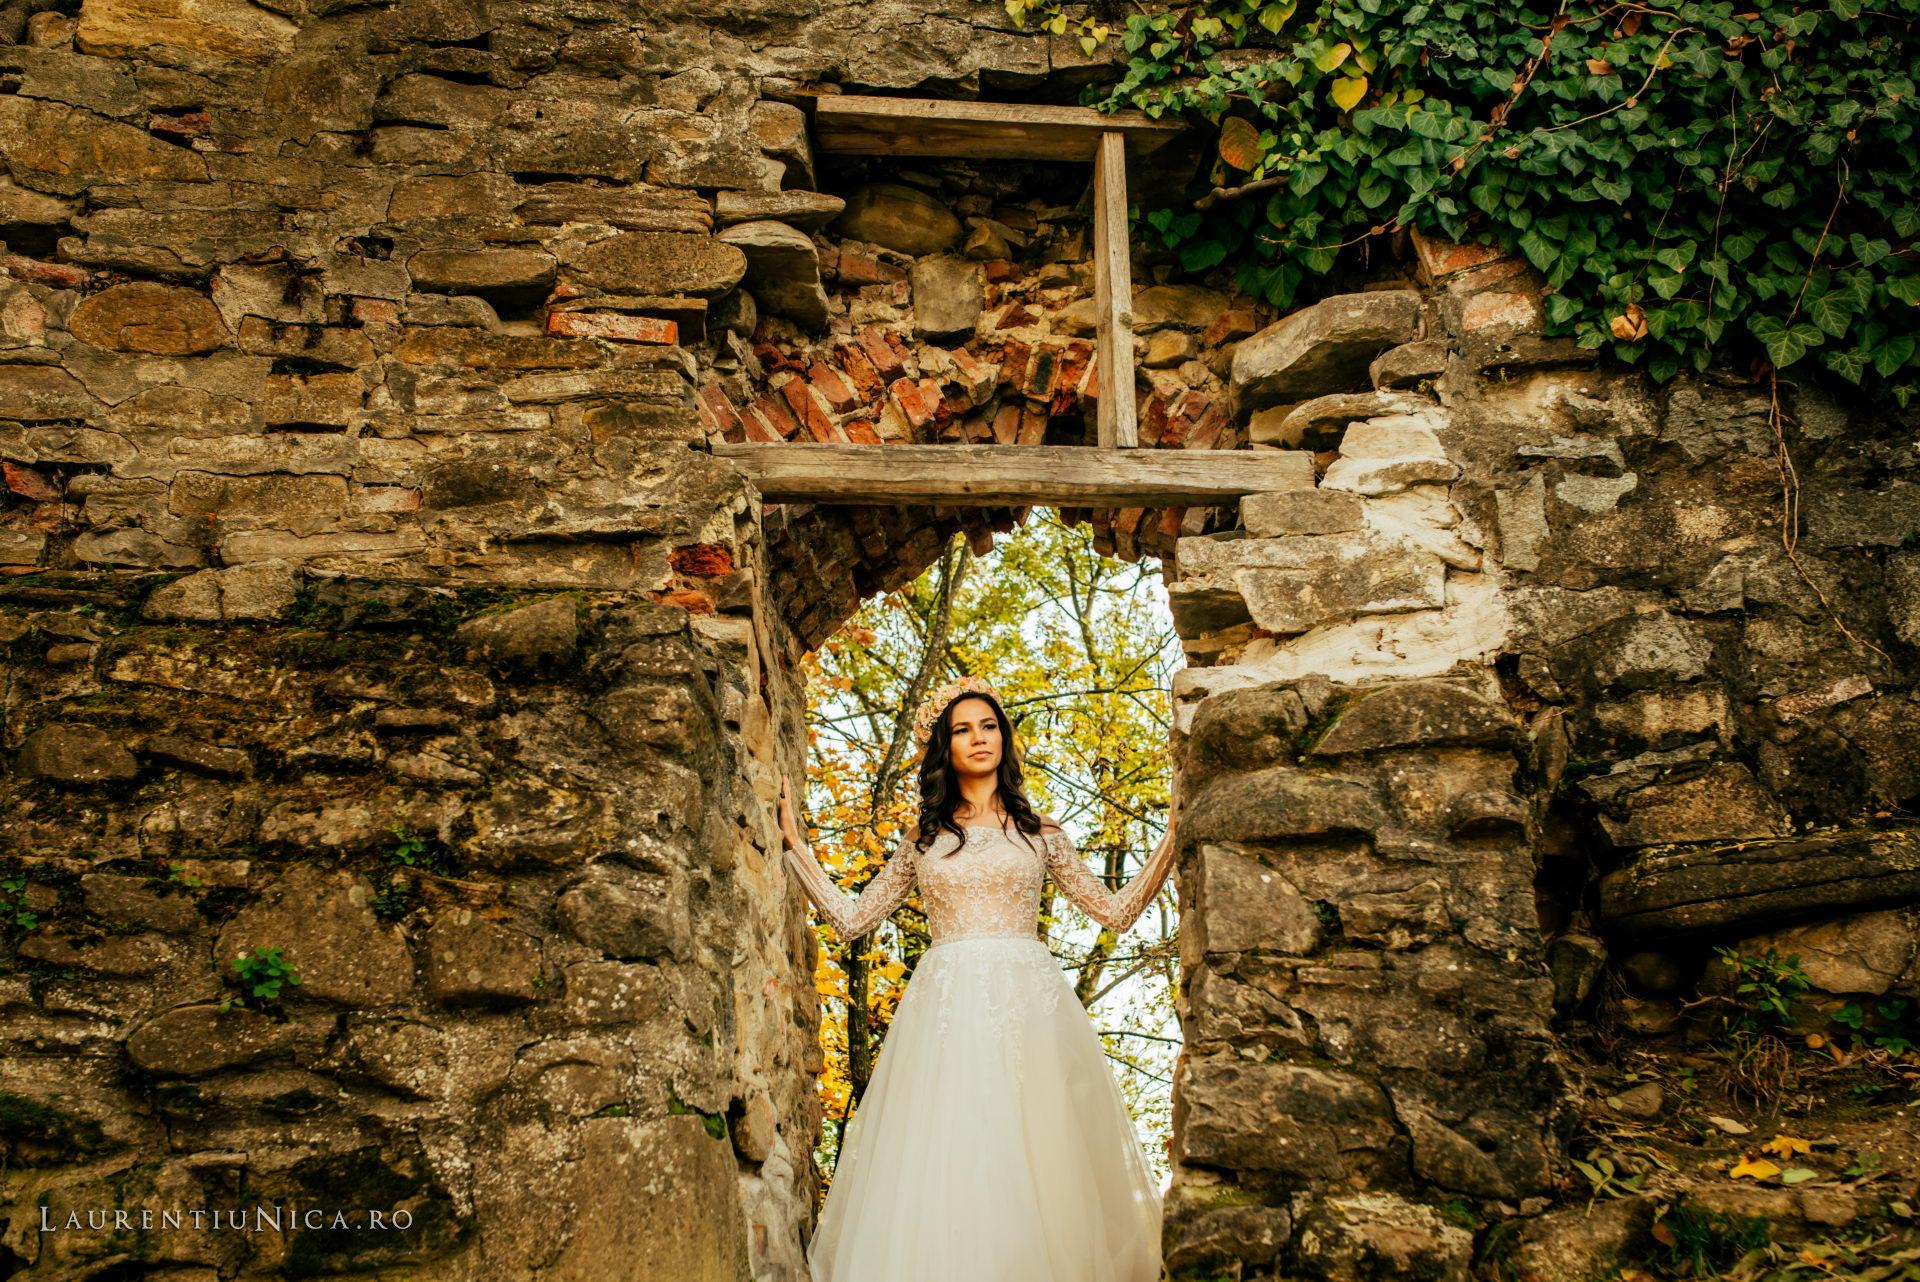 lili-si-dan-fotografii-nunta-after-wedding-sighisoara-laurentiu-nica23